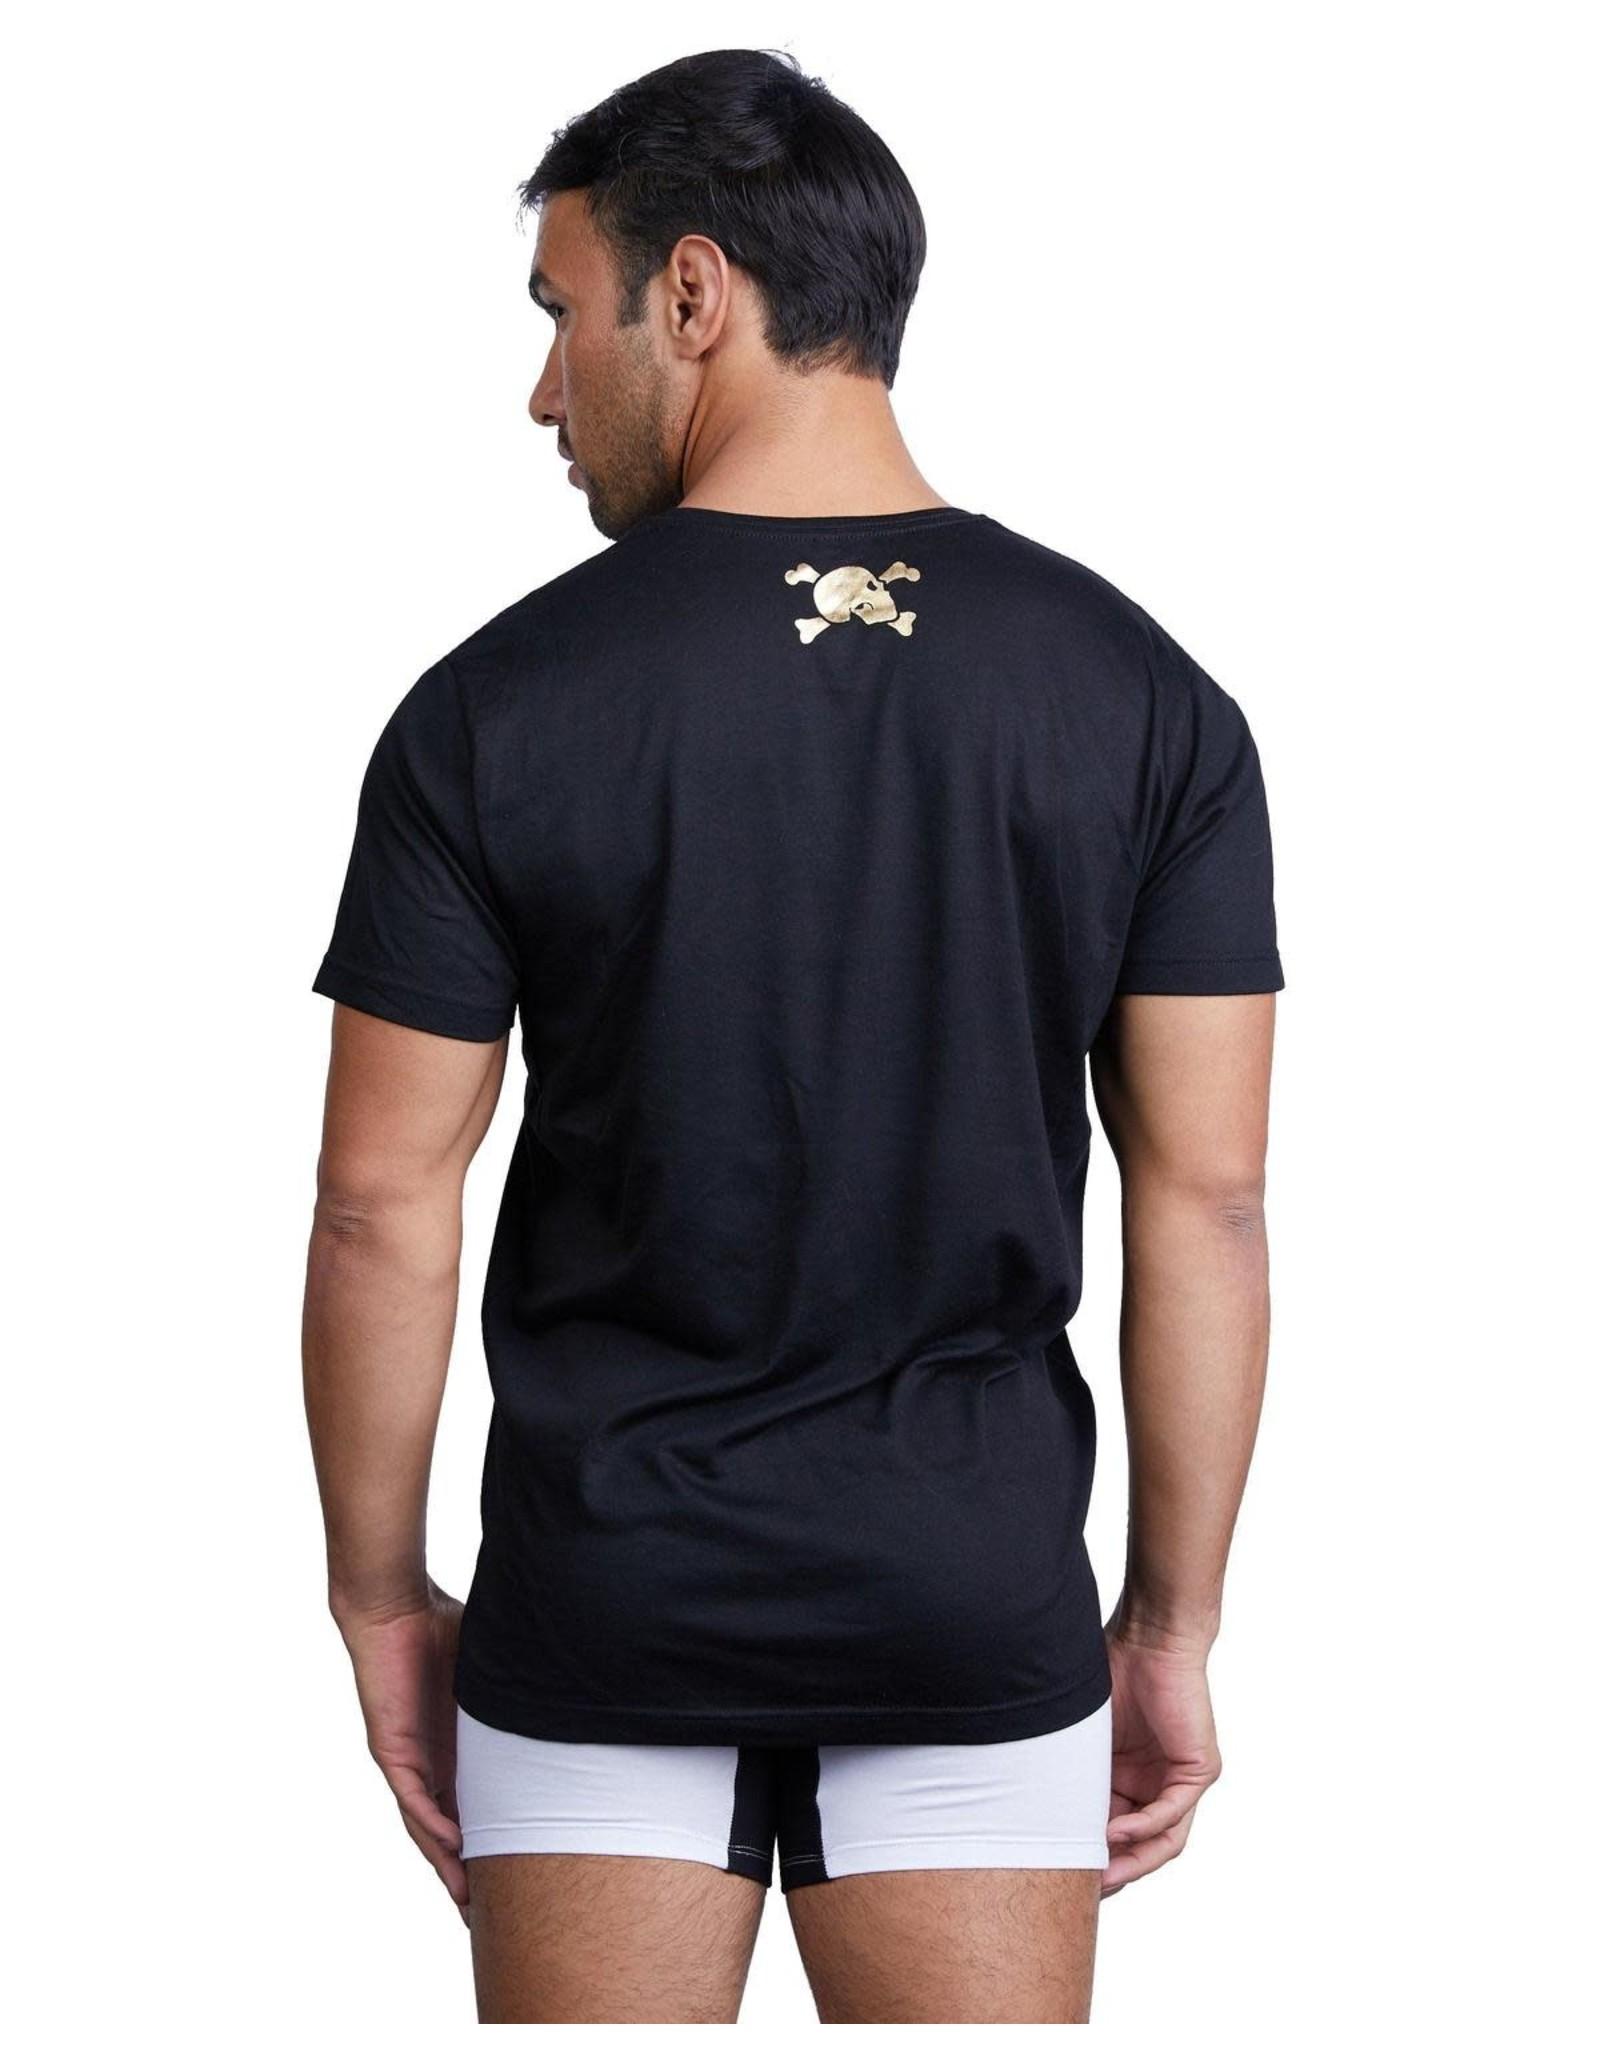 Skull & Bones Barcode T Shirt